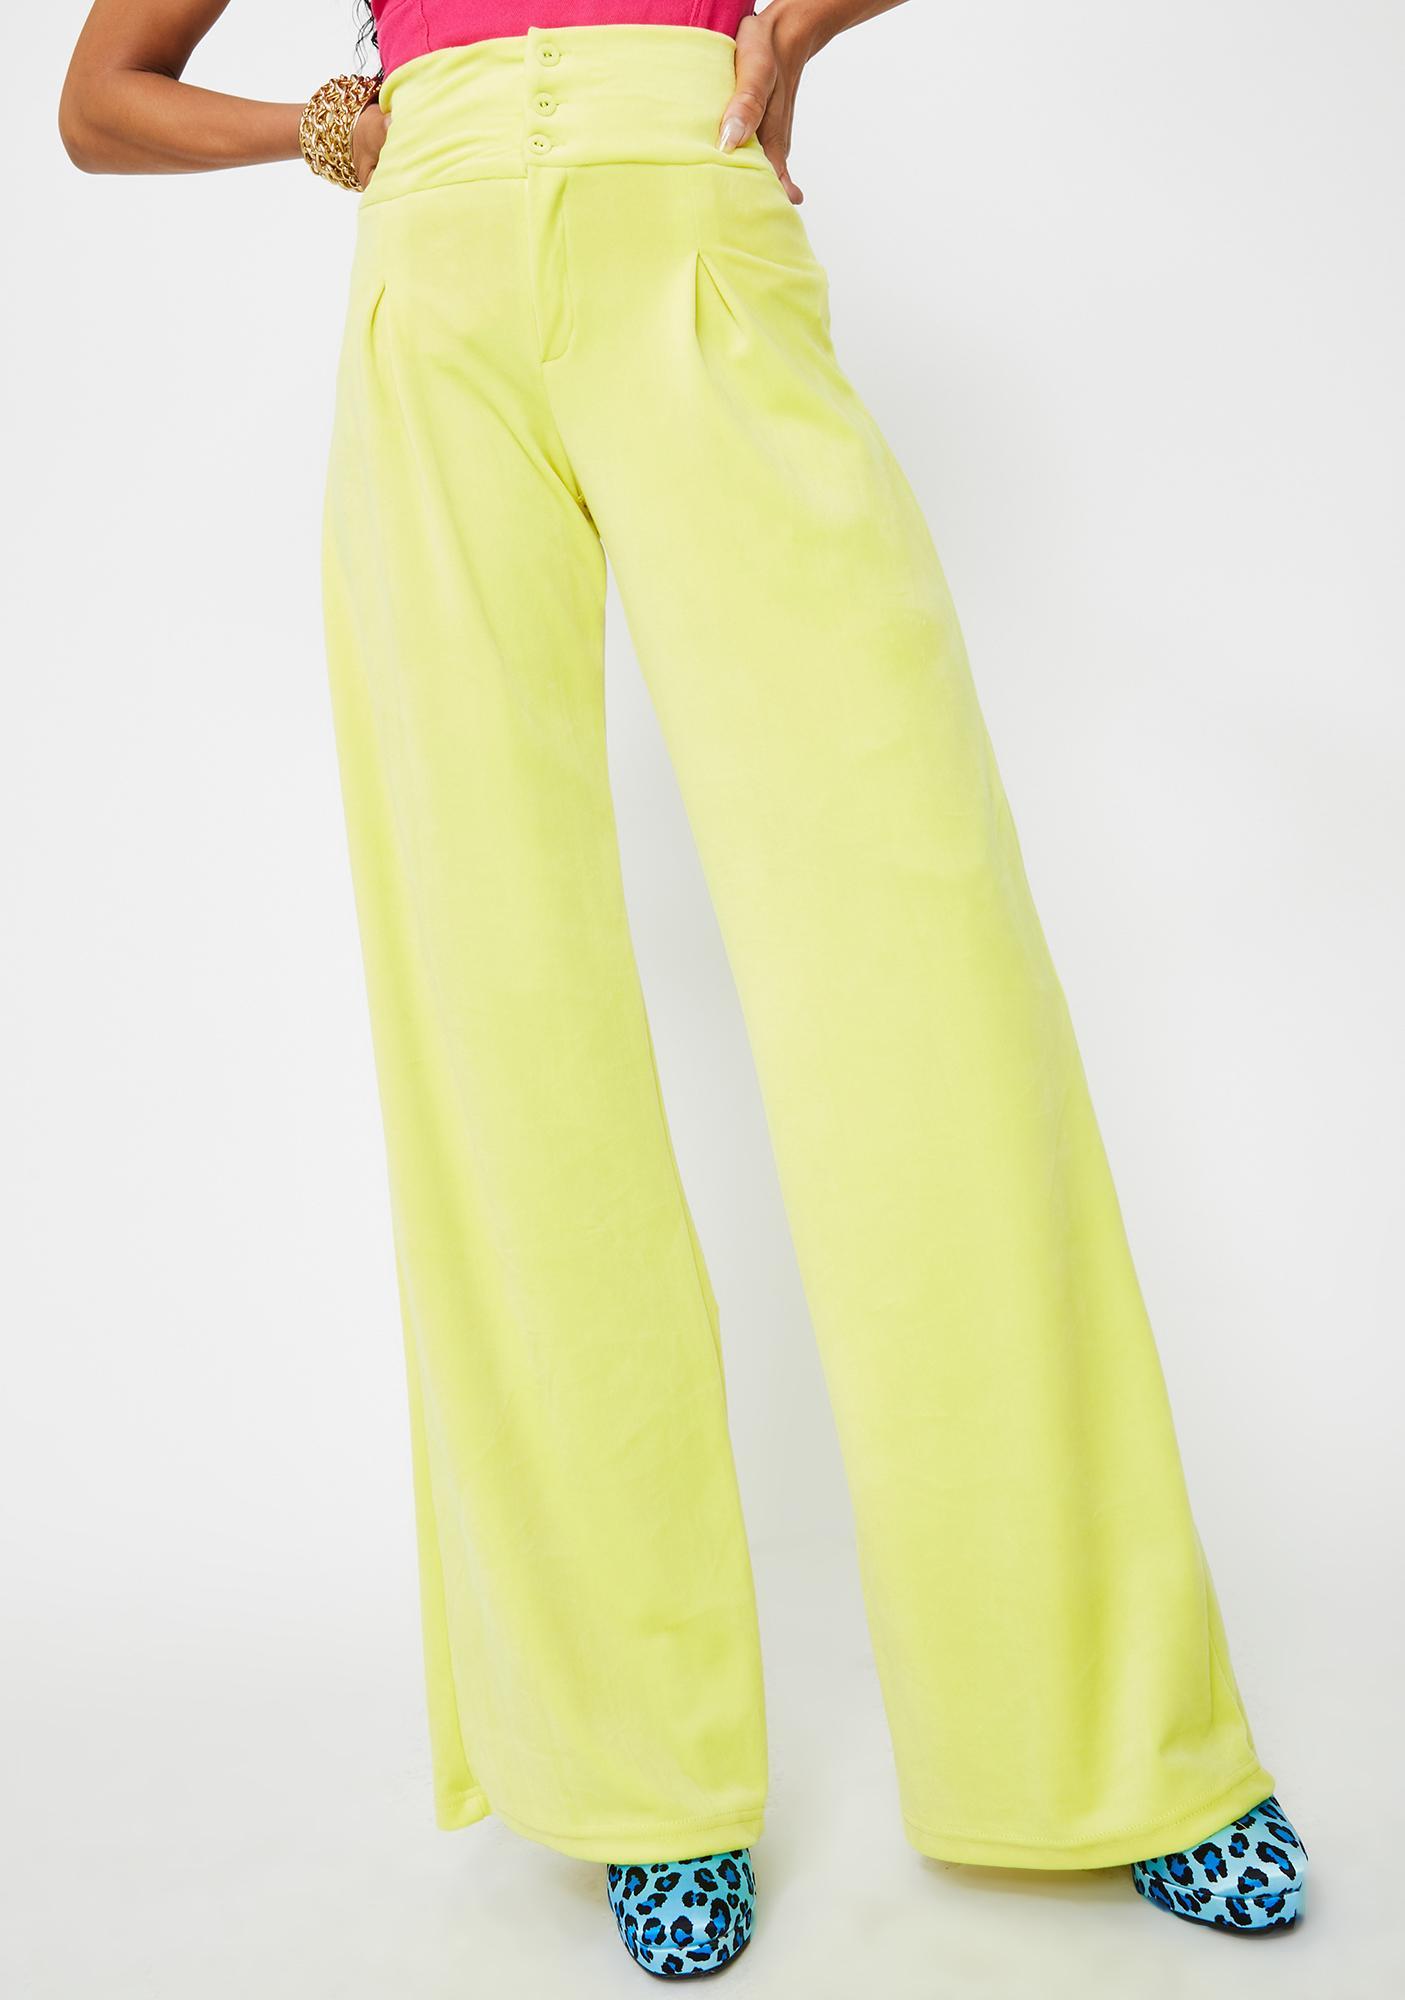 Elsie & Fred Riot Velour Wide Leg Pants